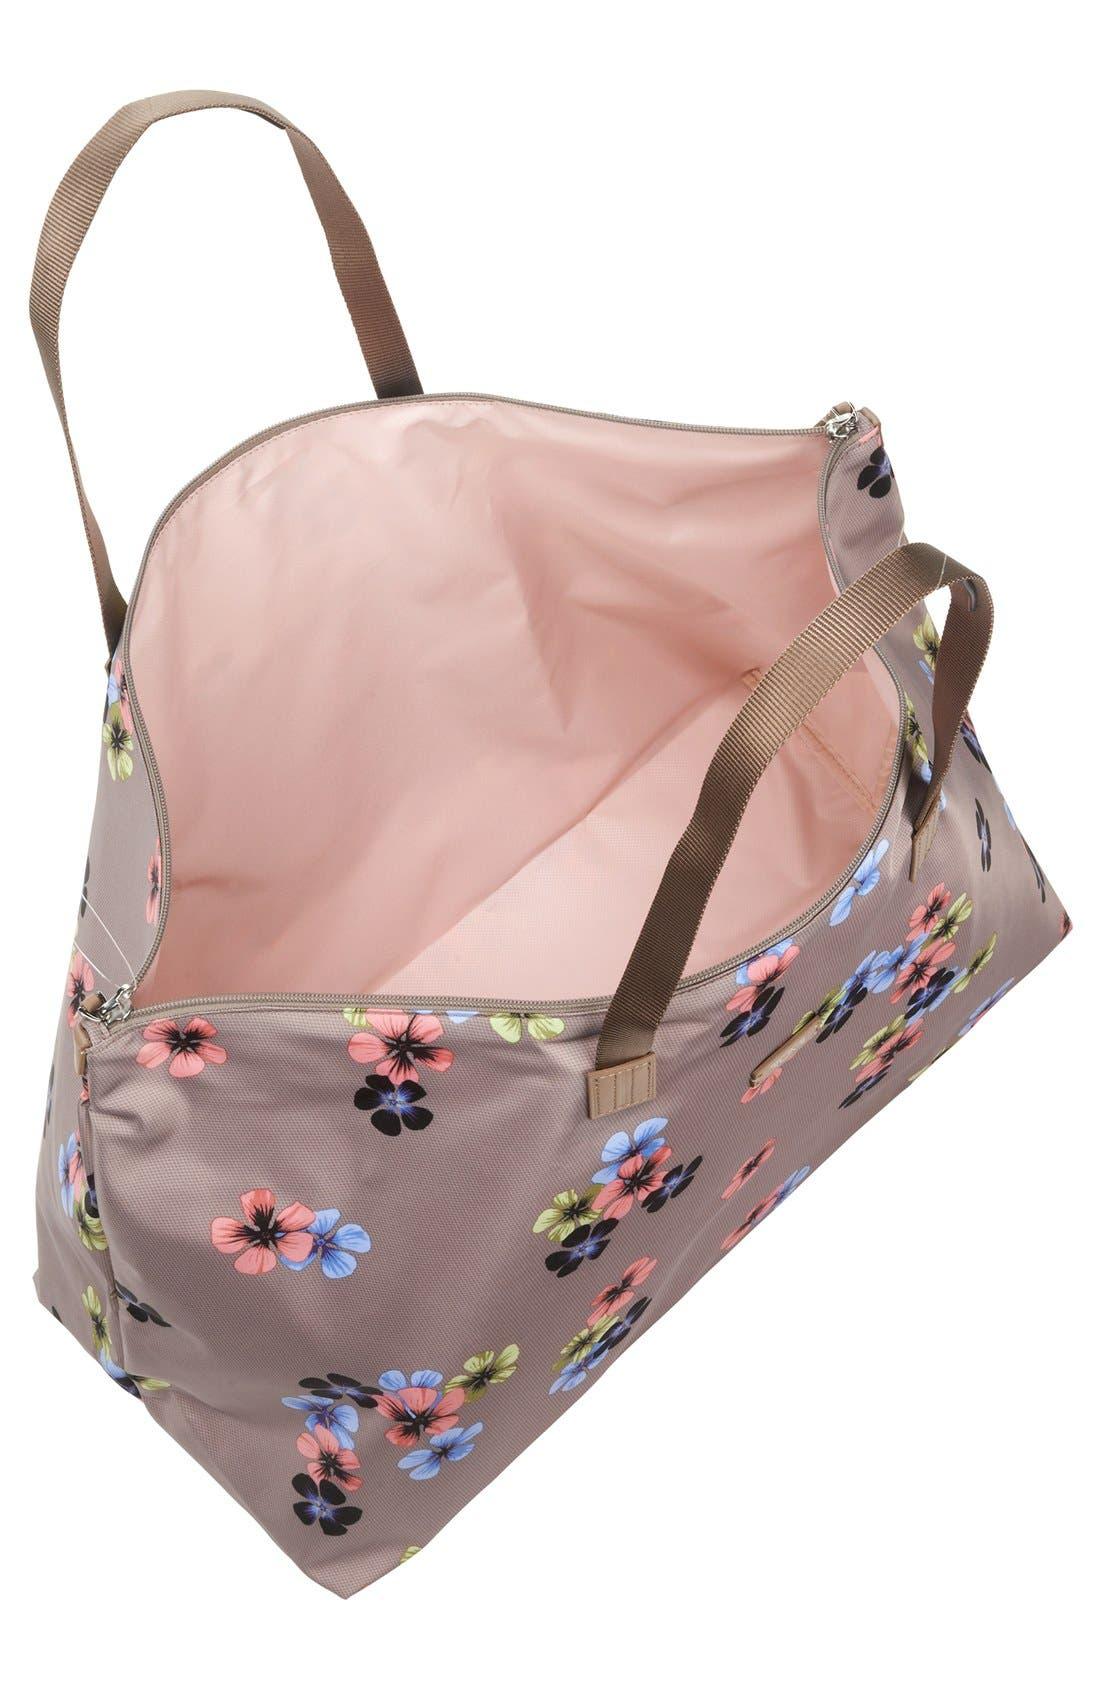 'Just In Case' Packable Duffel Bag,                             Alternate thumbnail 2, color,                             250